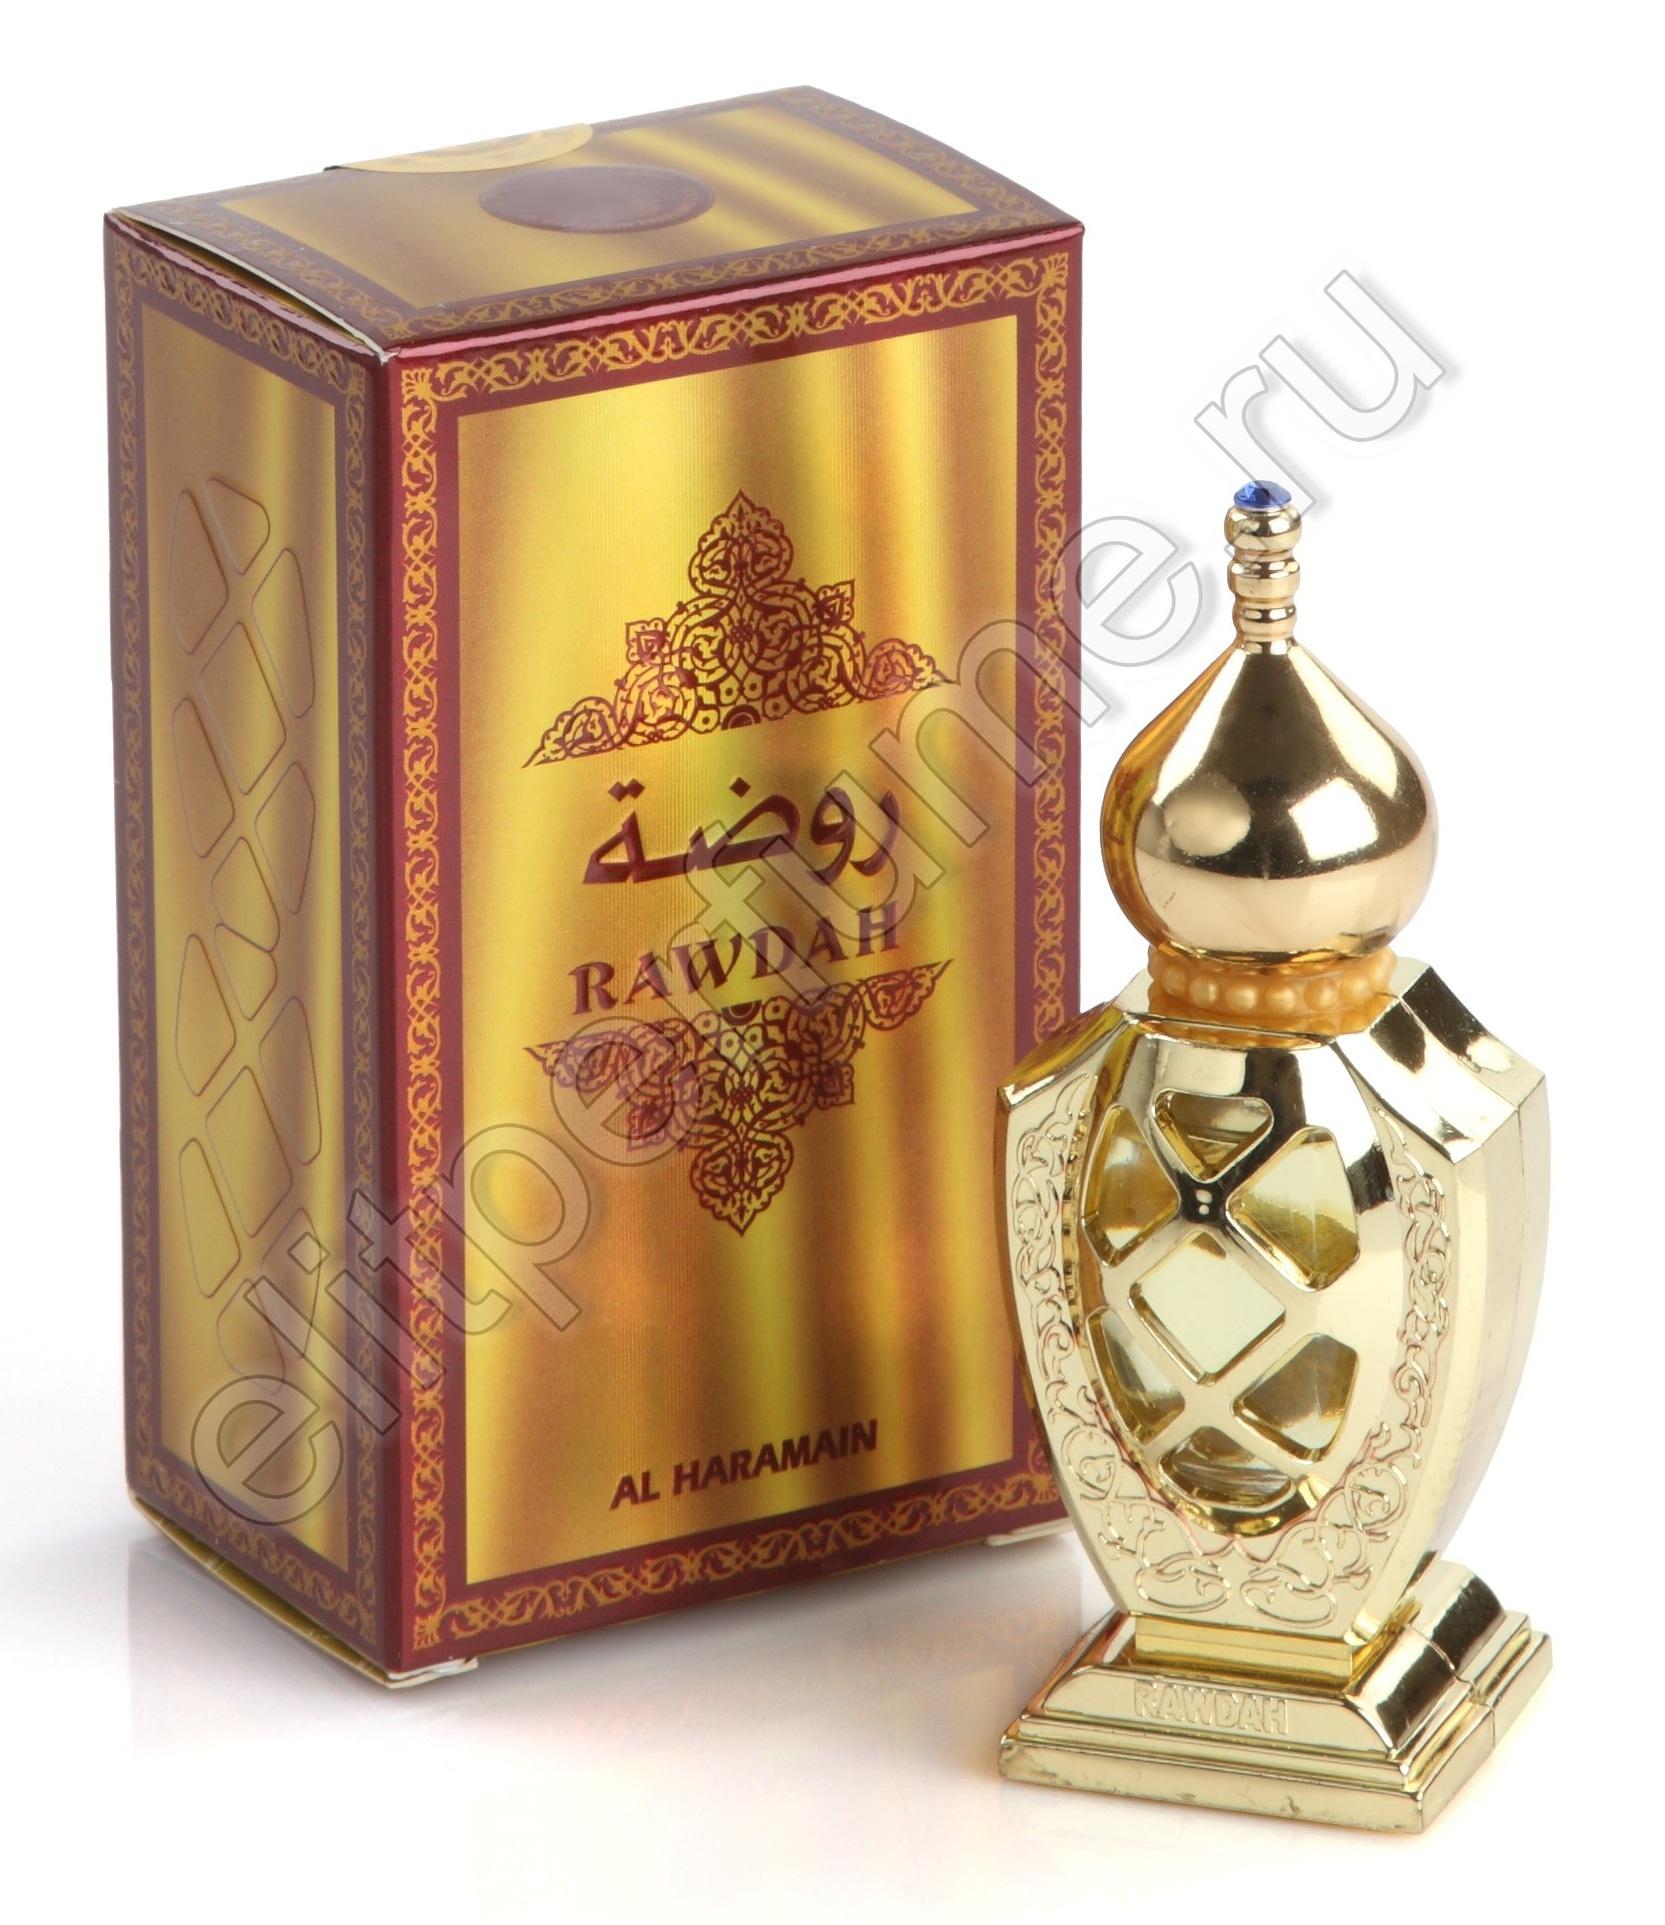 Пробники для духов Рауда Rawdah 1 мл арабские масляные духи от Аль Харамайн Al Haramin Perfumes